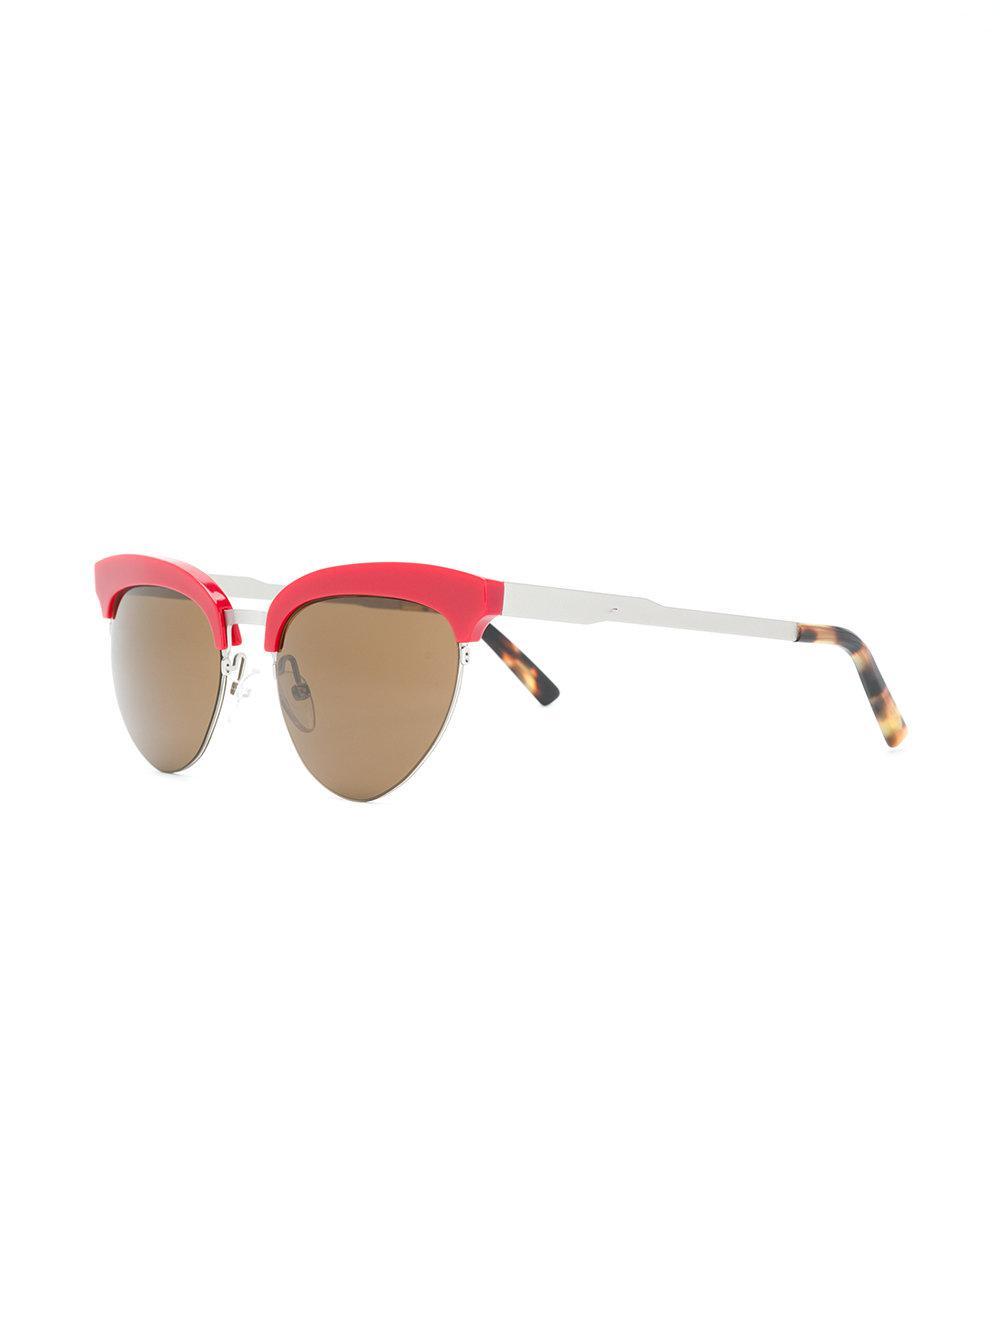 Kyme Greta Sunglasses in Red